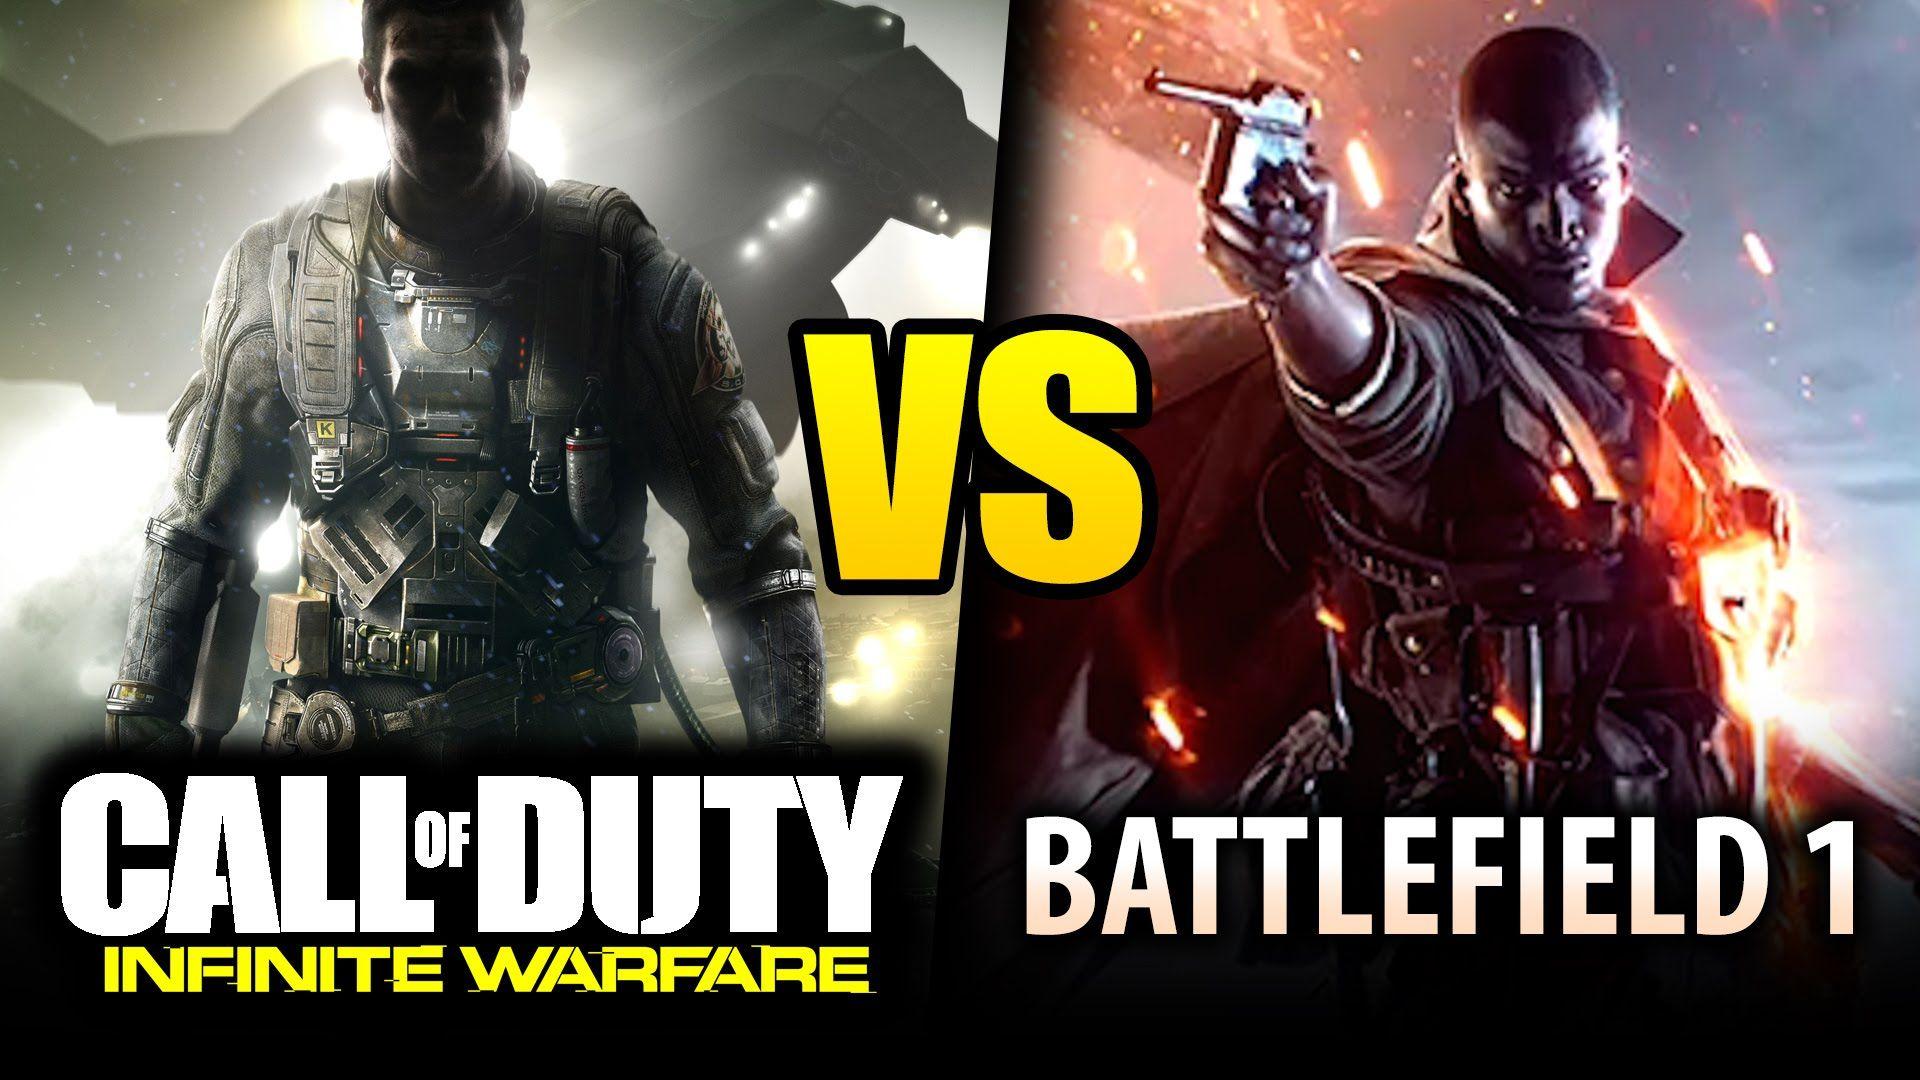 Battlefield 1 Vs Call Of Duty Infinite Warfare Which Game To Buy Infinite Warfare Battlefield 1 Callofduty